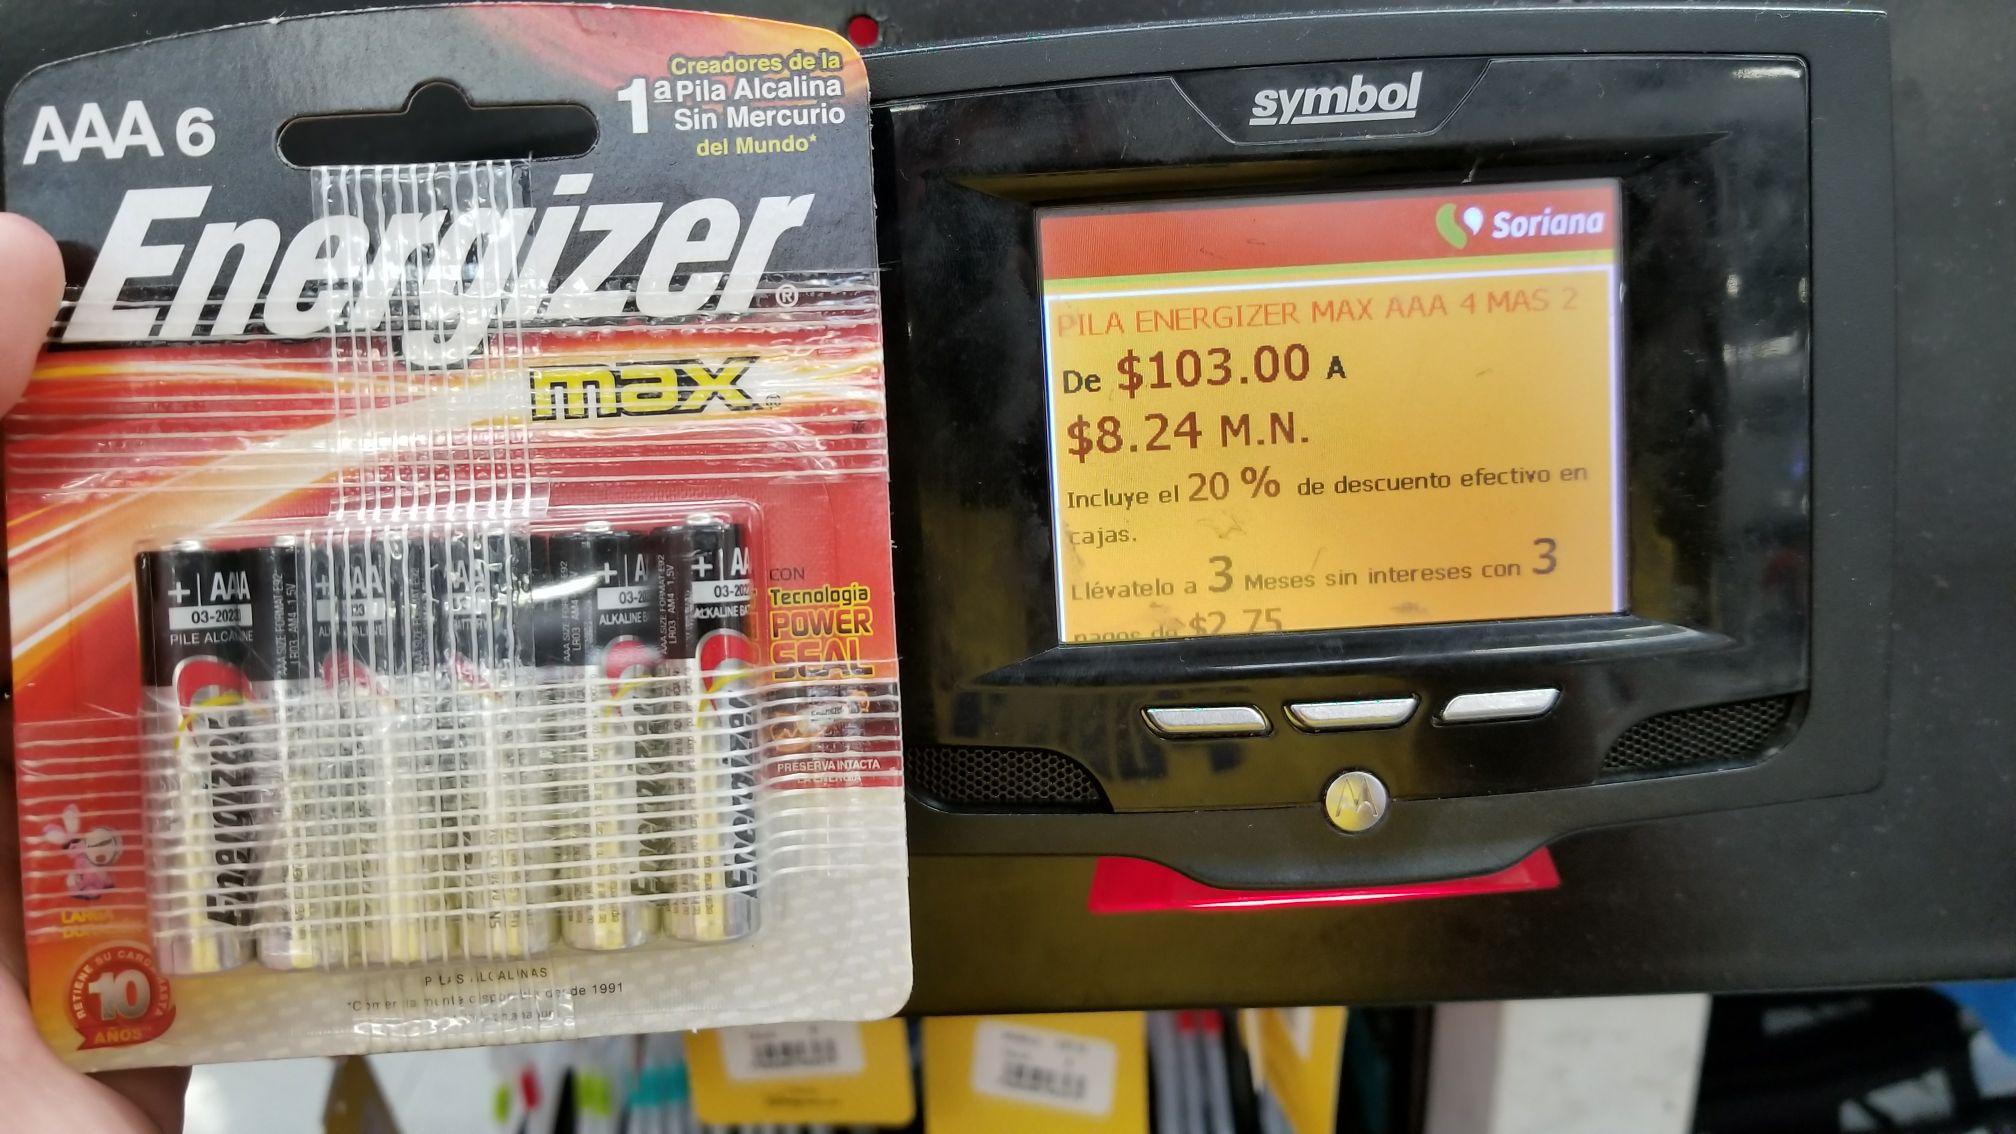 Soriana: Pilas energizer maxx AAA